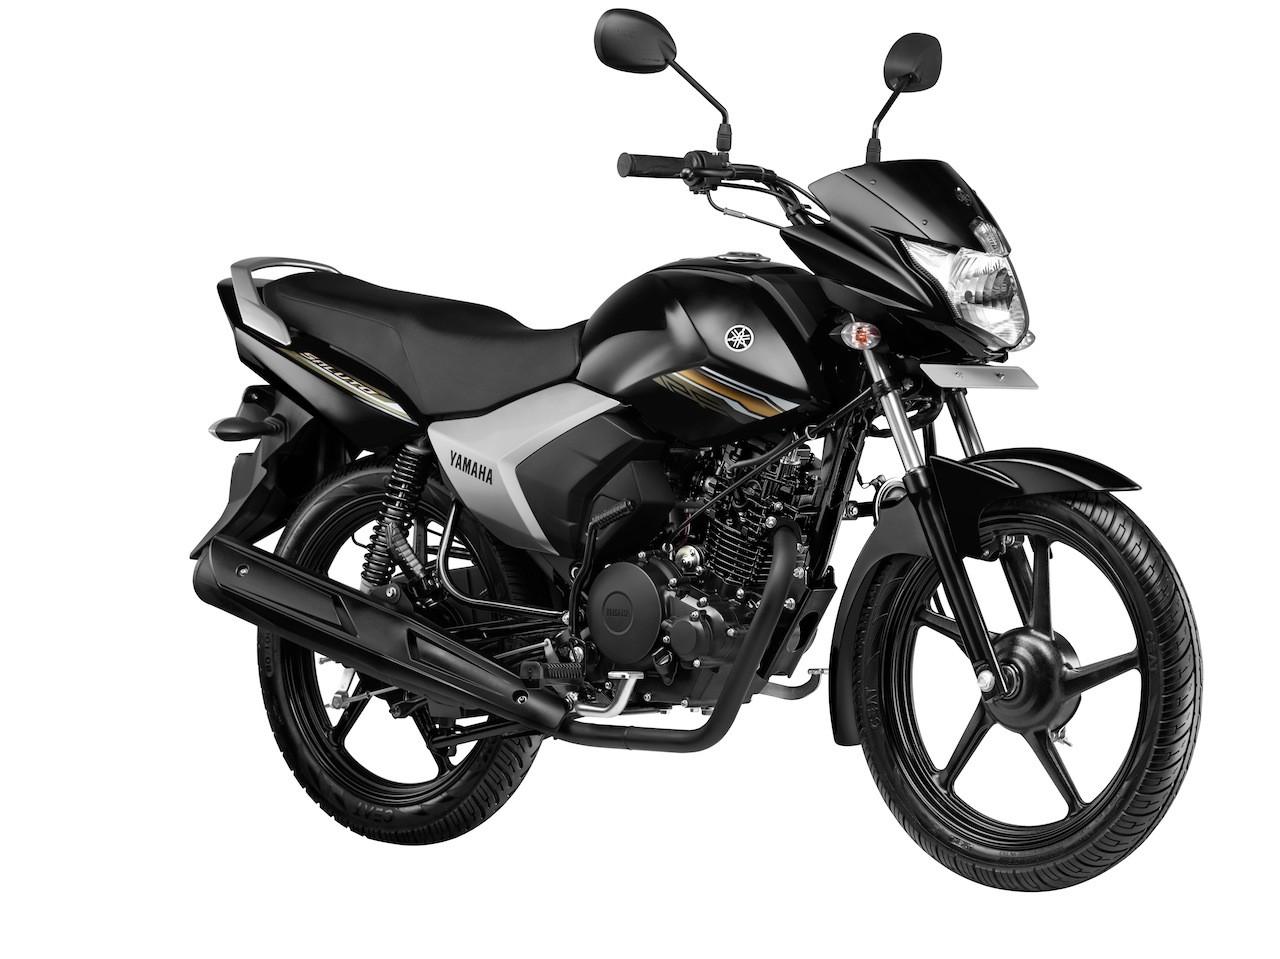 Yamaha Bike Indian Price List